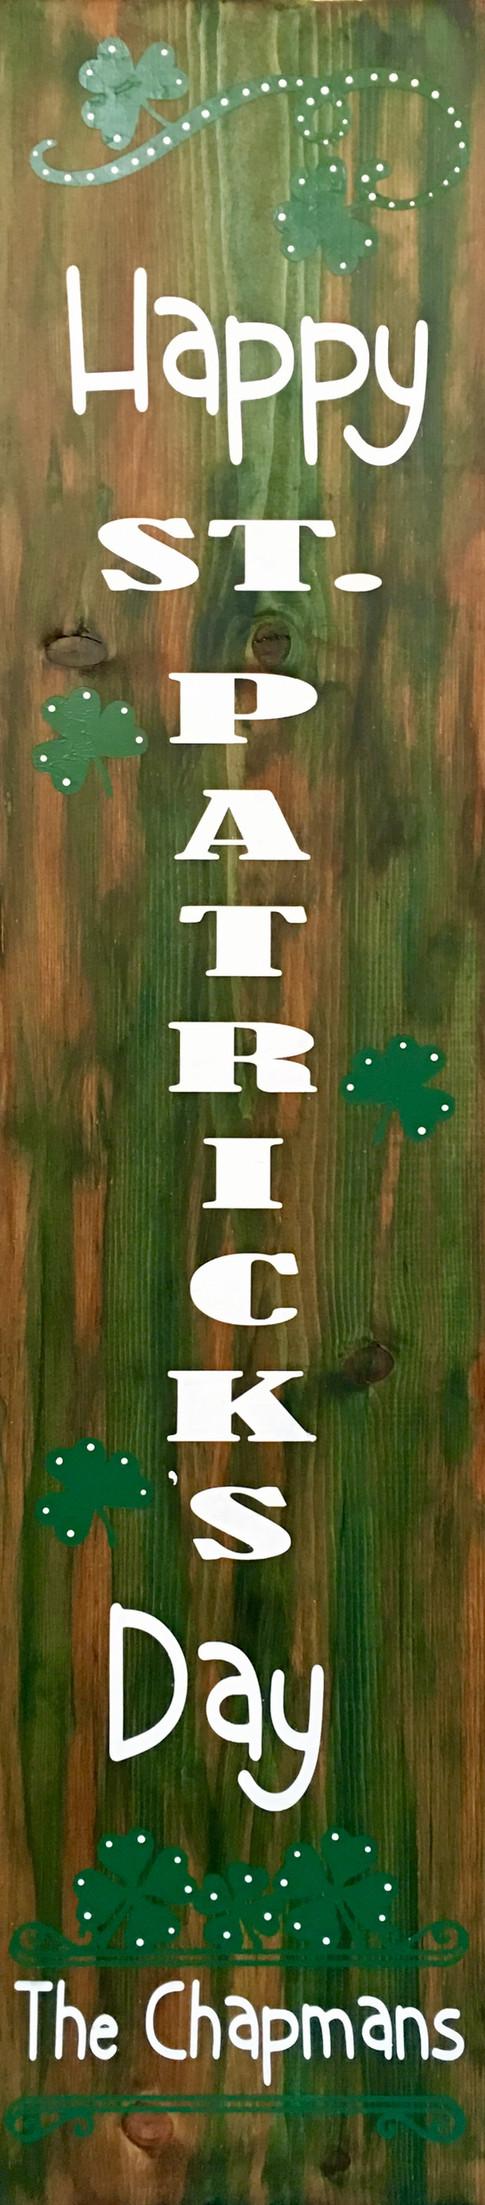 Happy St. Patrick's Day Porch Board